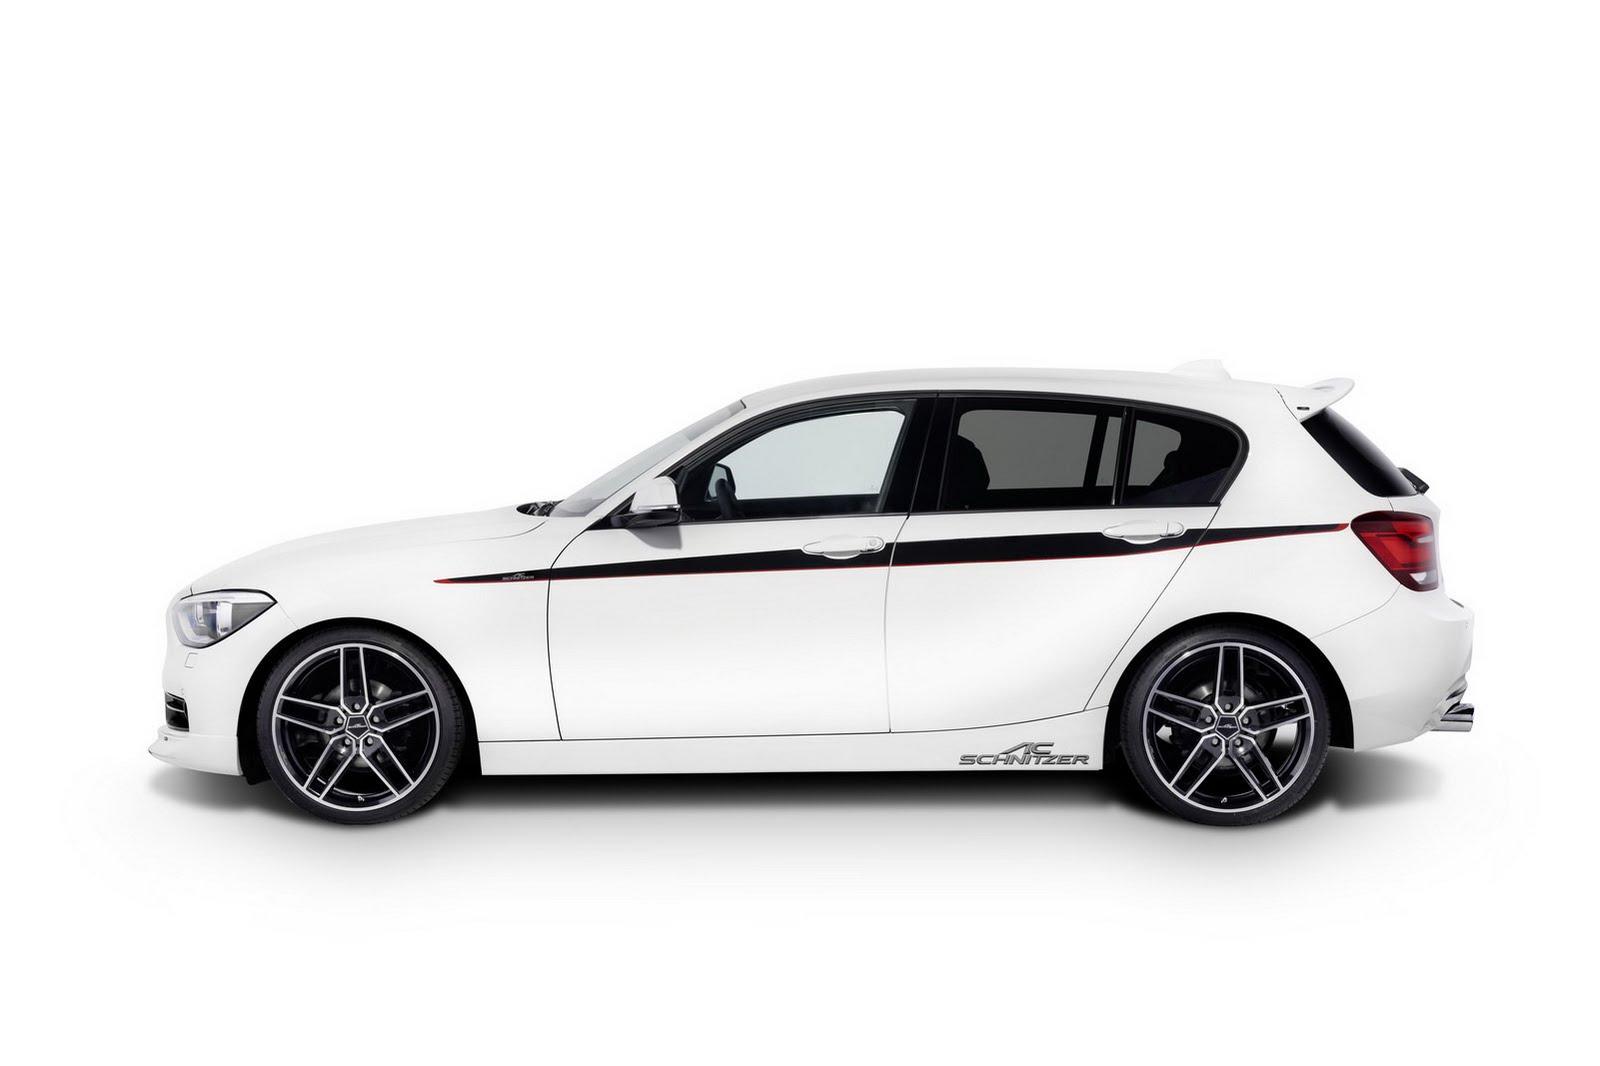 F20 BMW 1 Series by AC Schnitzer